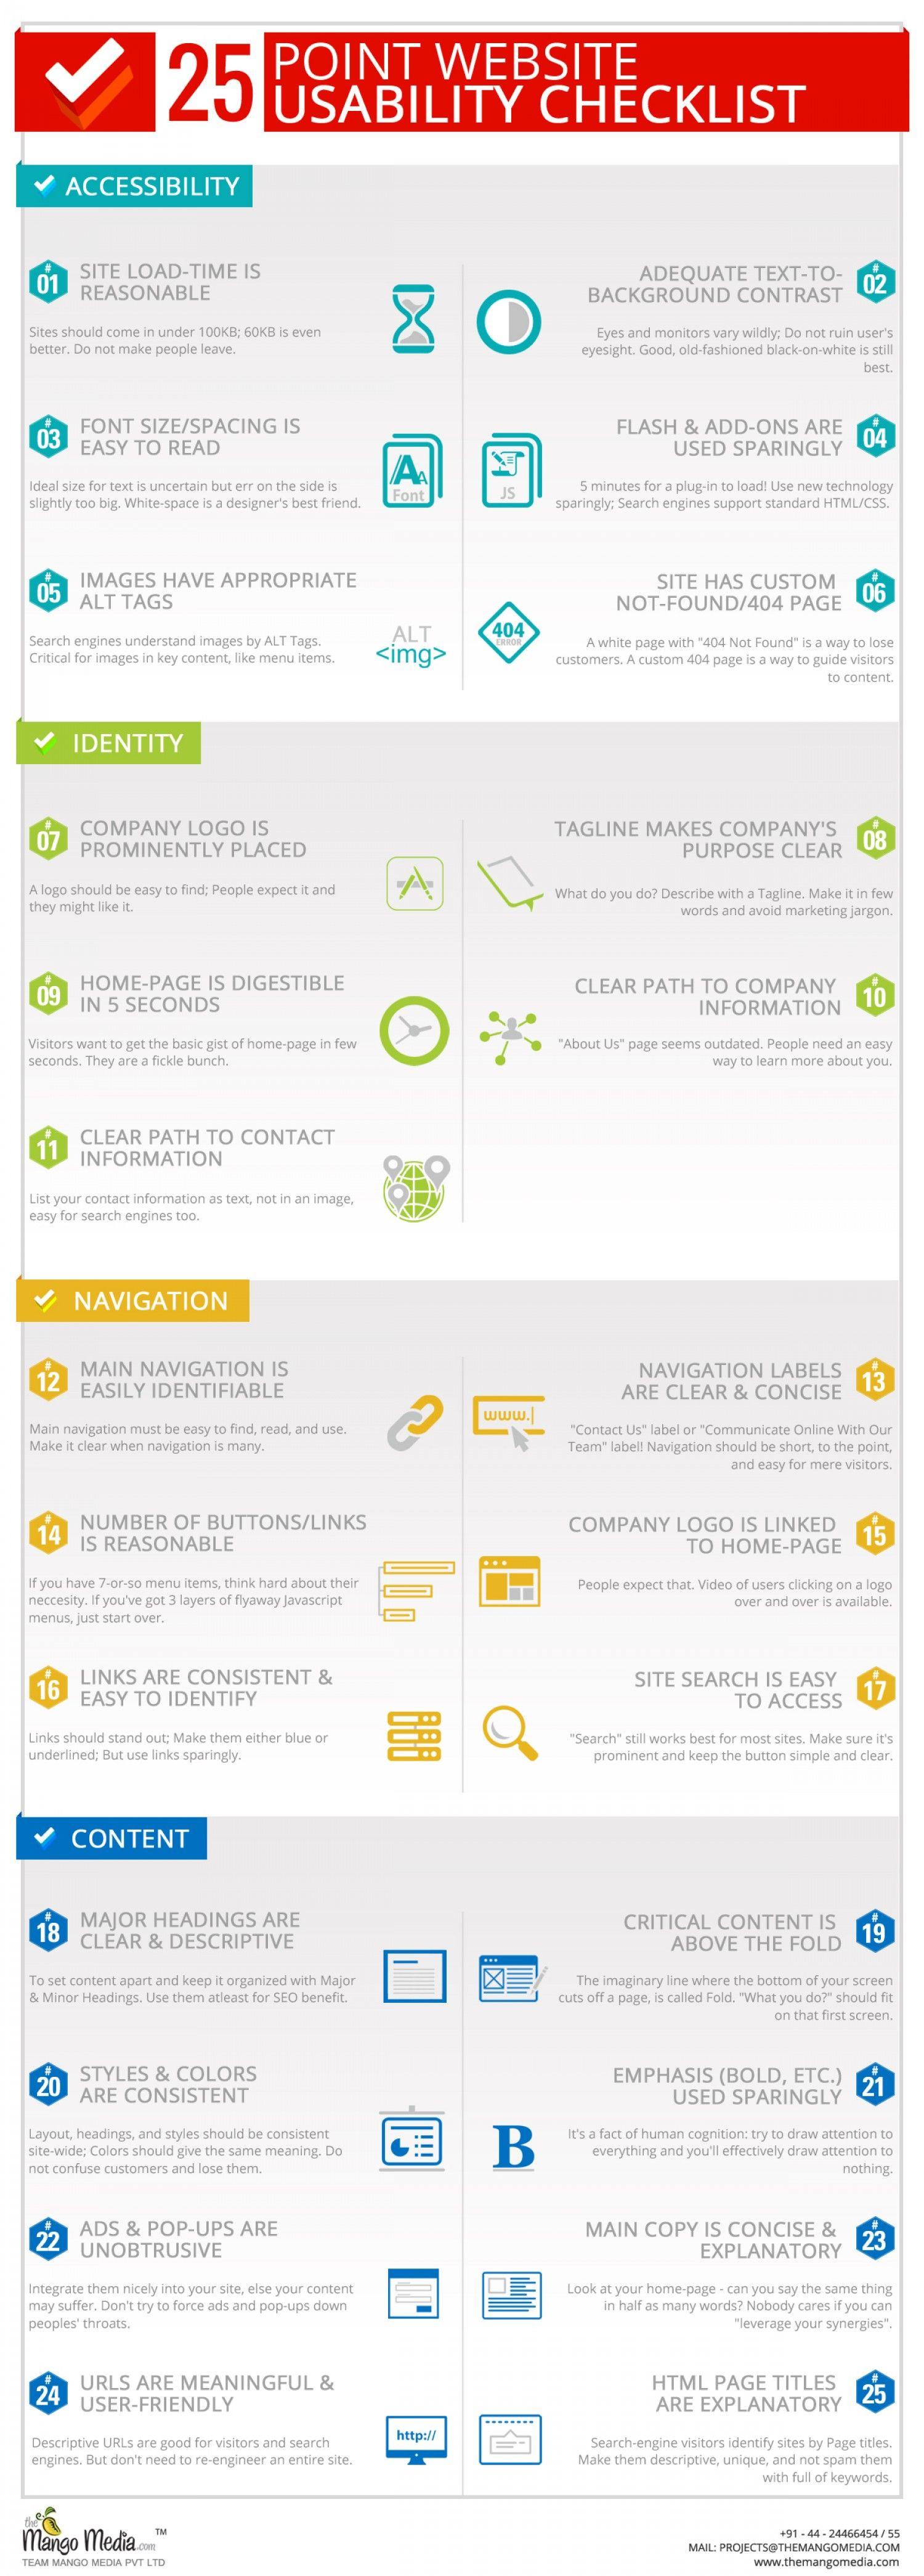 The 25 Point Website Usability Checklist Web Design Tips Website Checklist Web Development Design